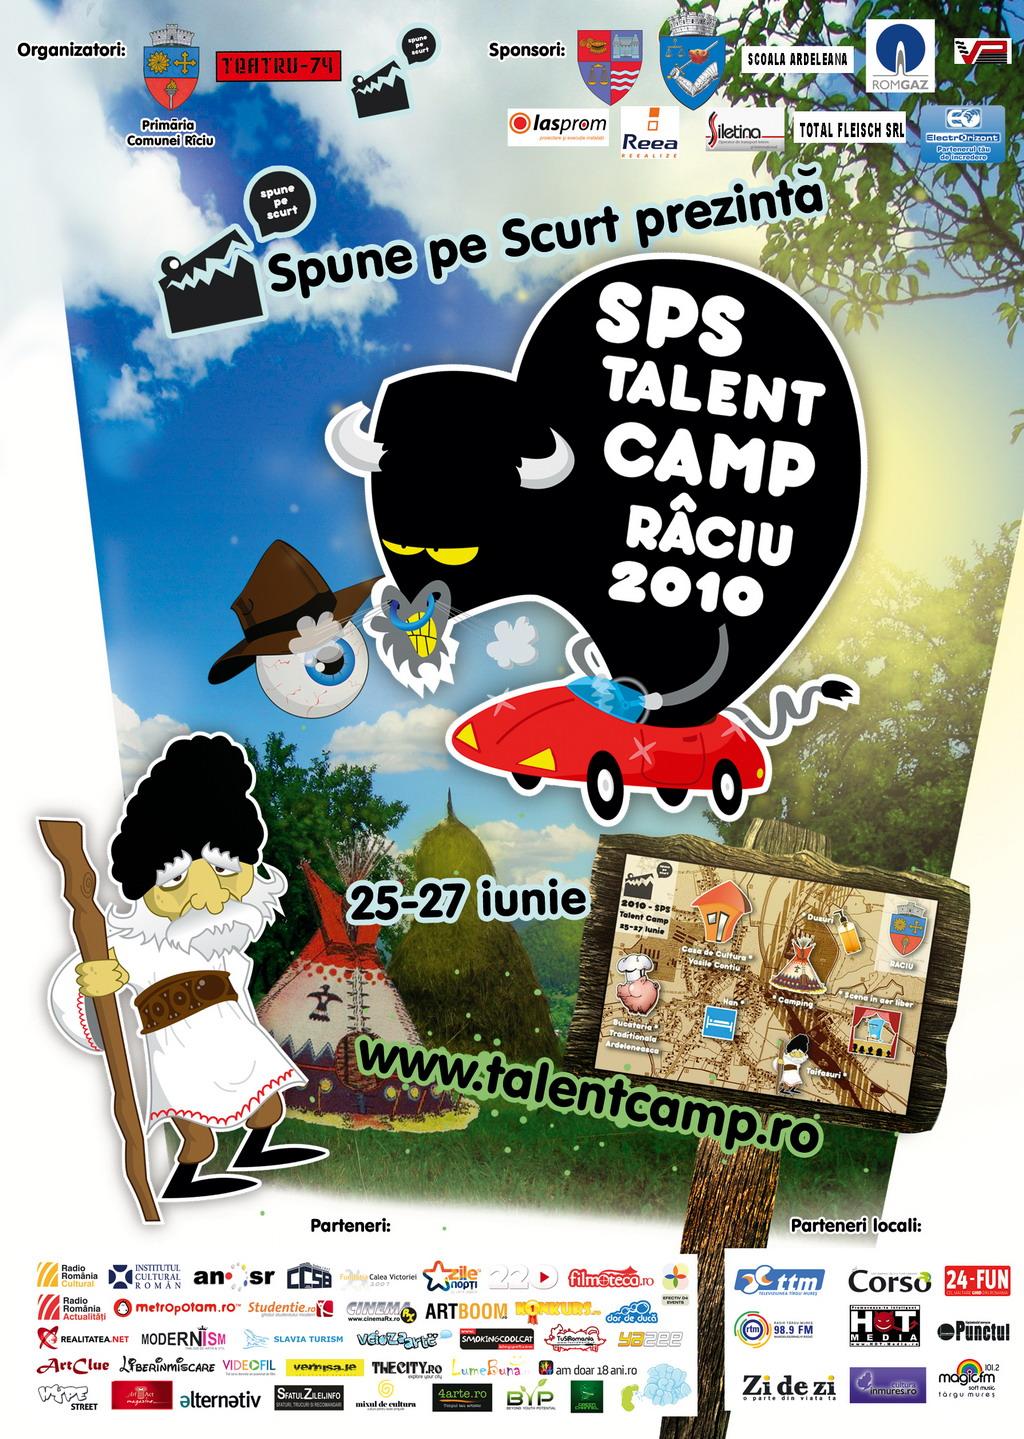 SPS Talent Camp